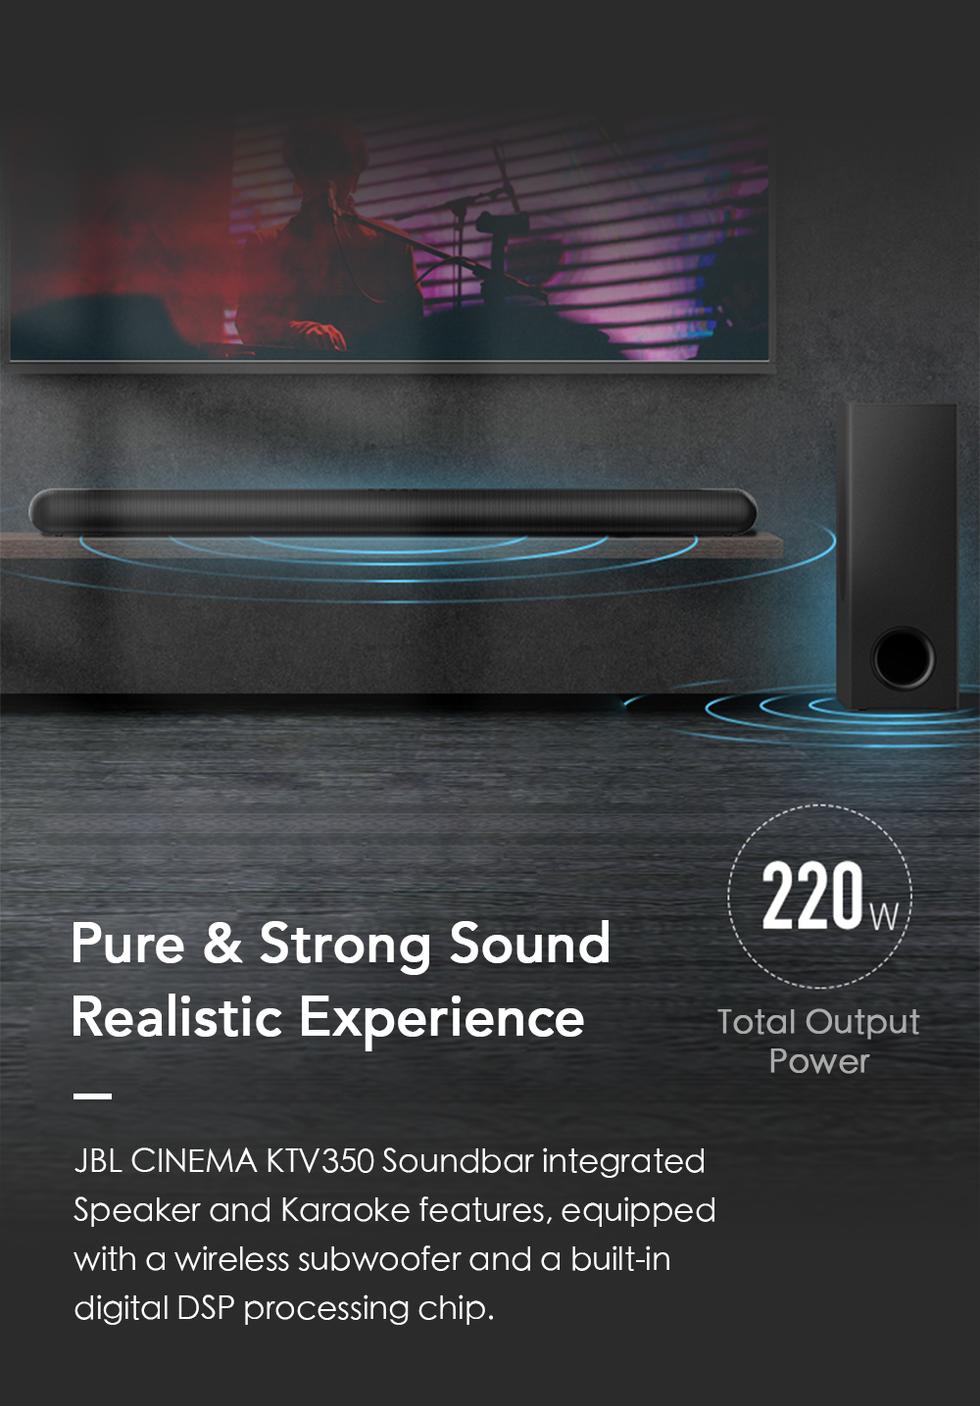 JBL-CINEMA-KTV350-Catalogue-(ENG)4.png